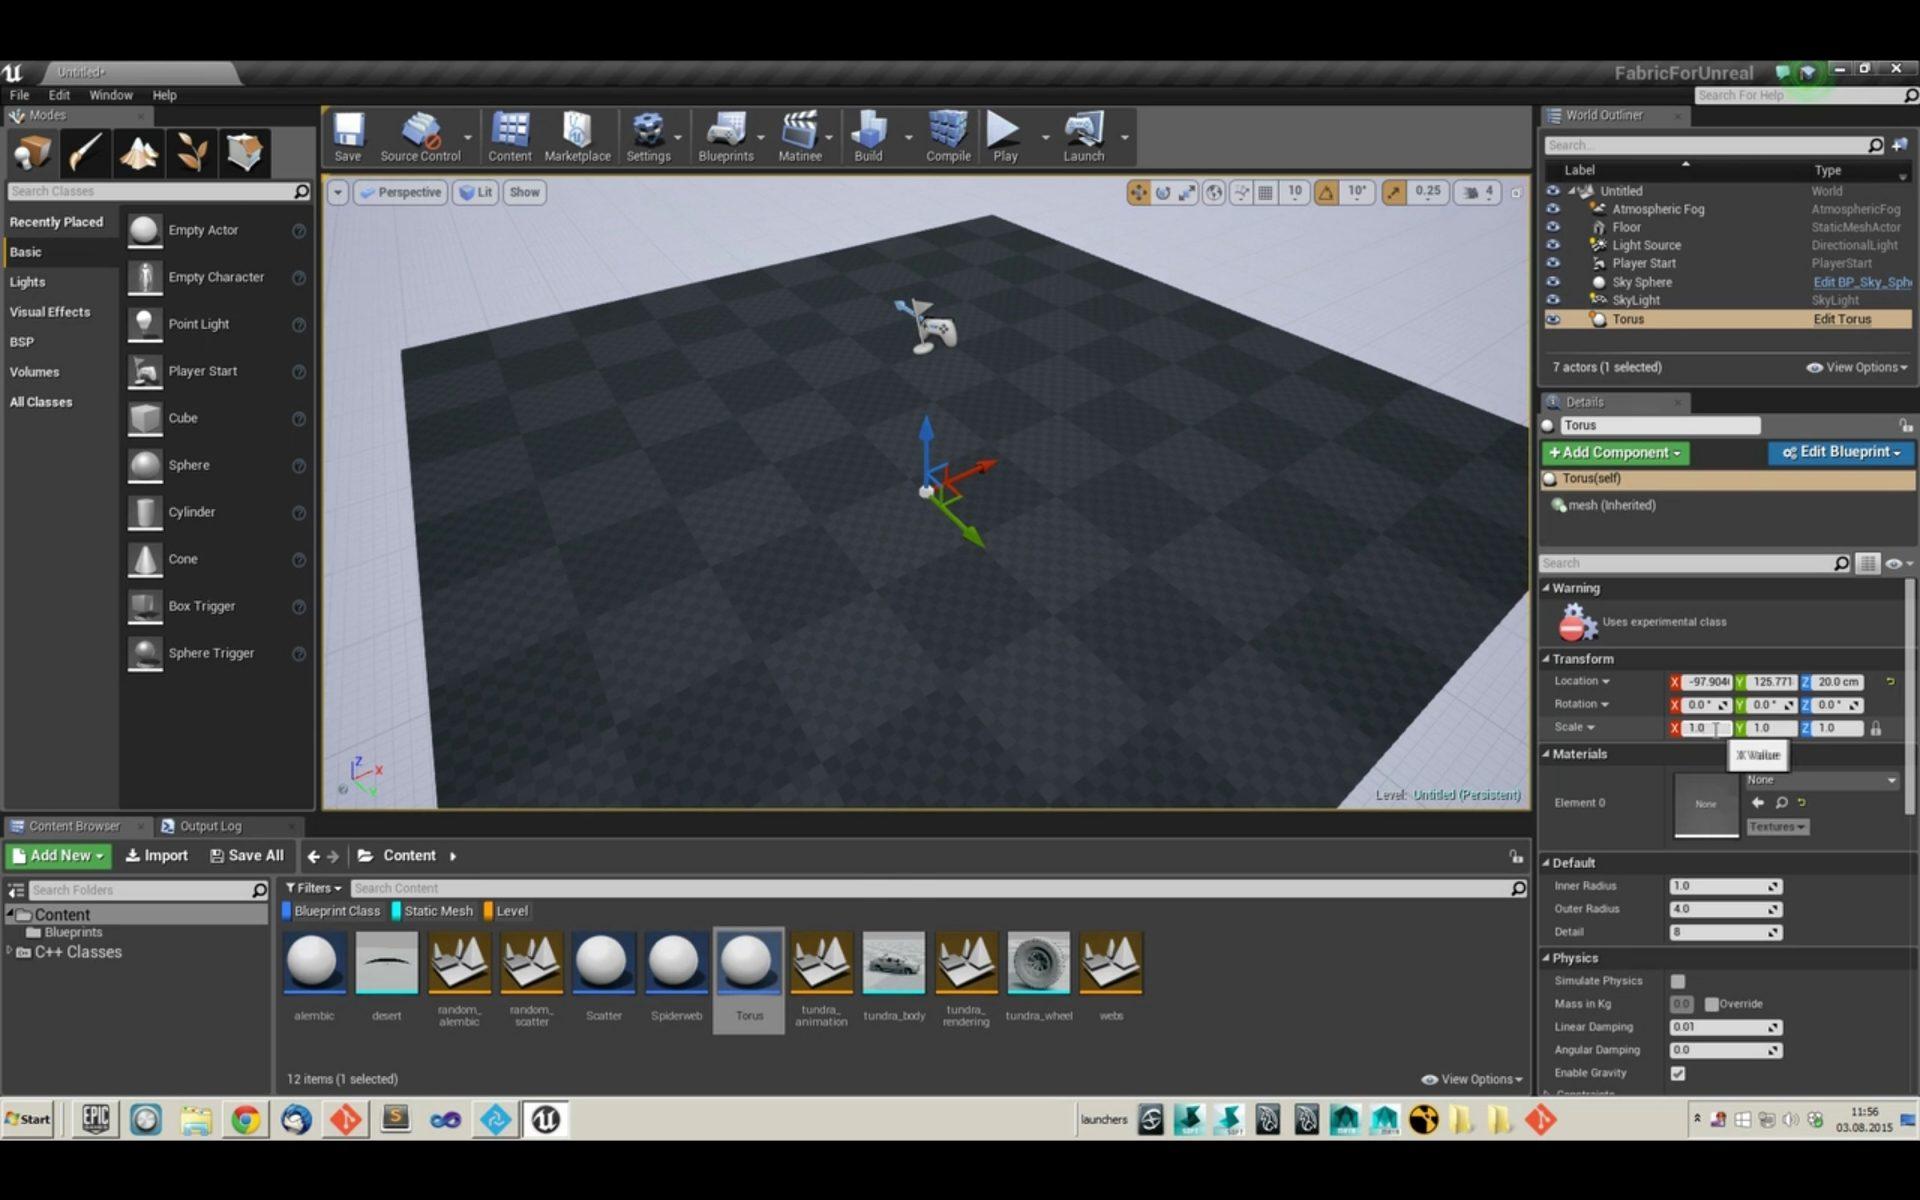 Fabric Engine 2: Unreal Engine 4 integration